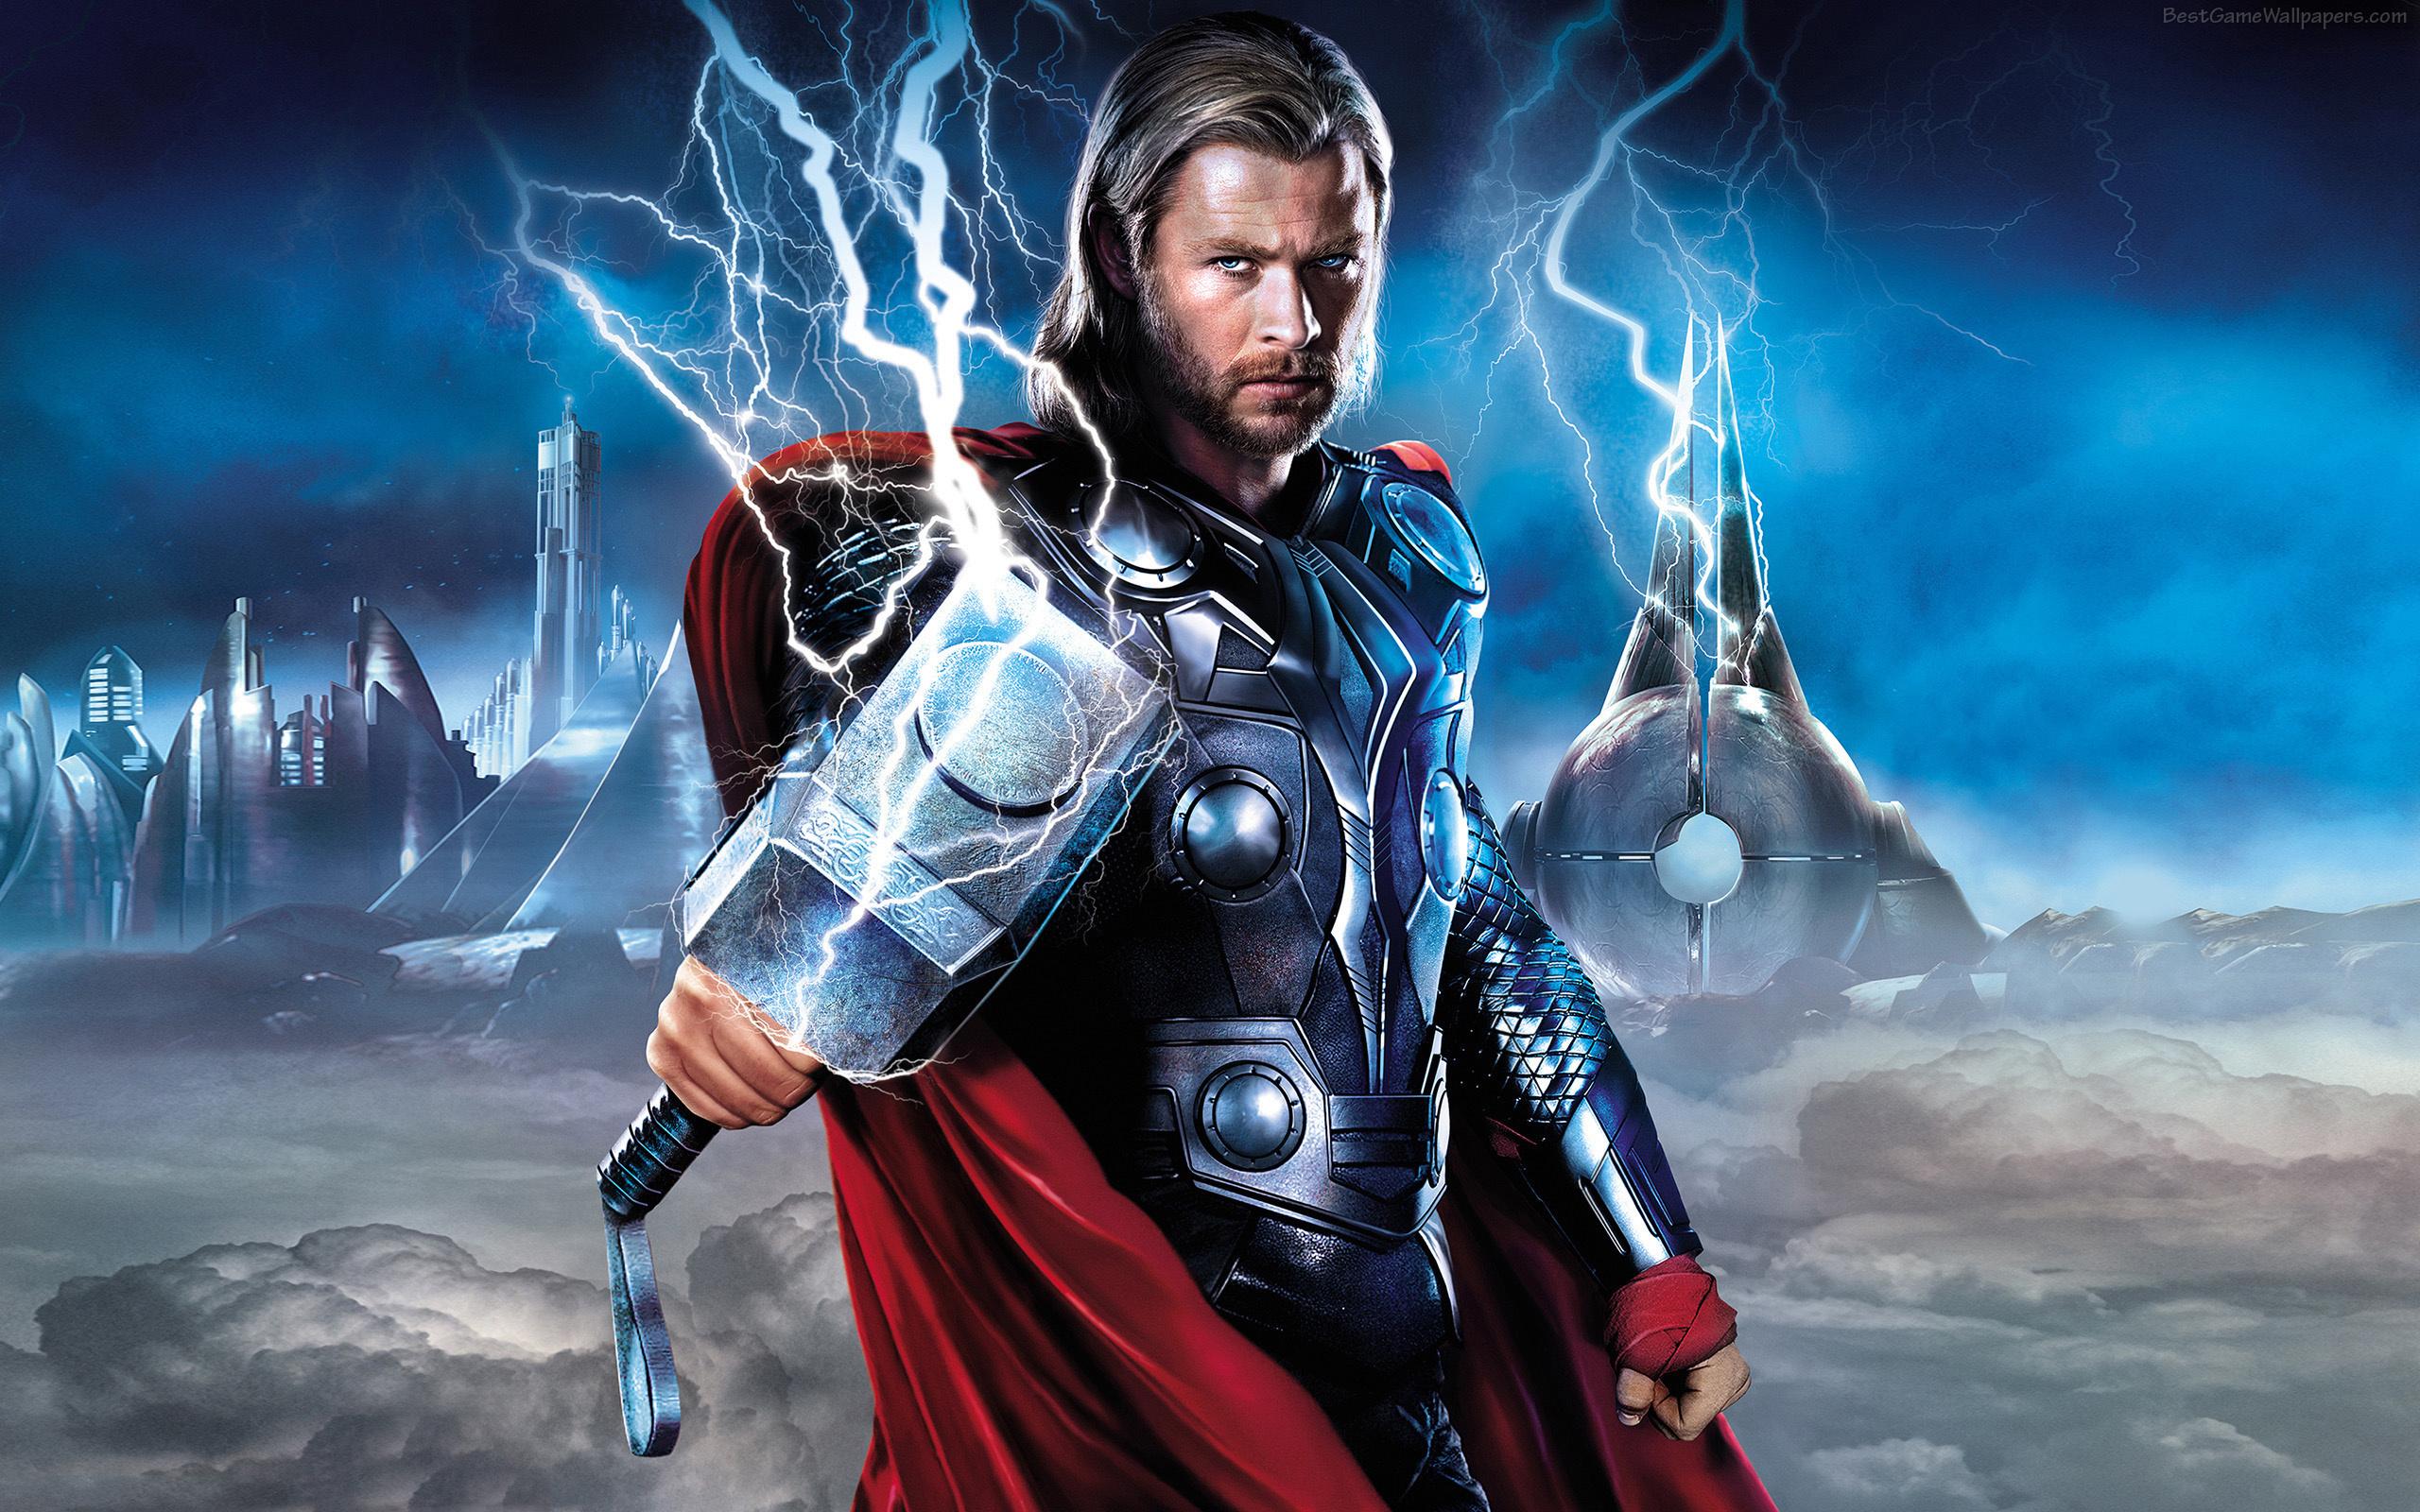 THOR superhero comics movie wallpaper 2560x1600 148902 2560x1600